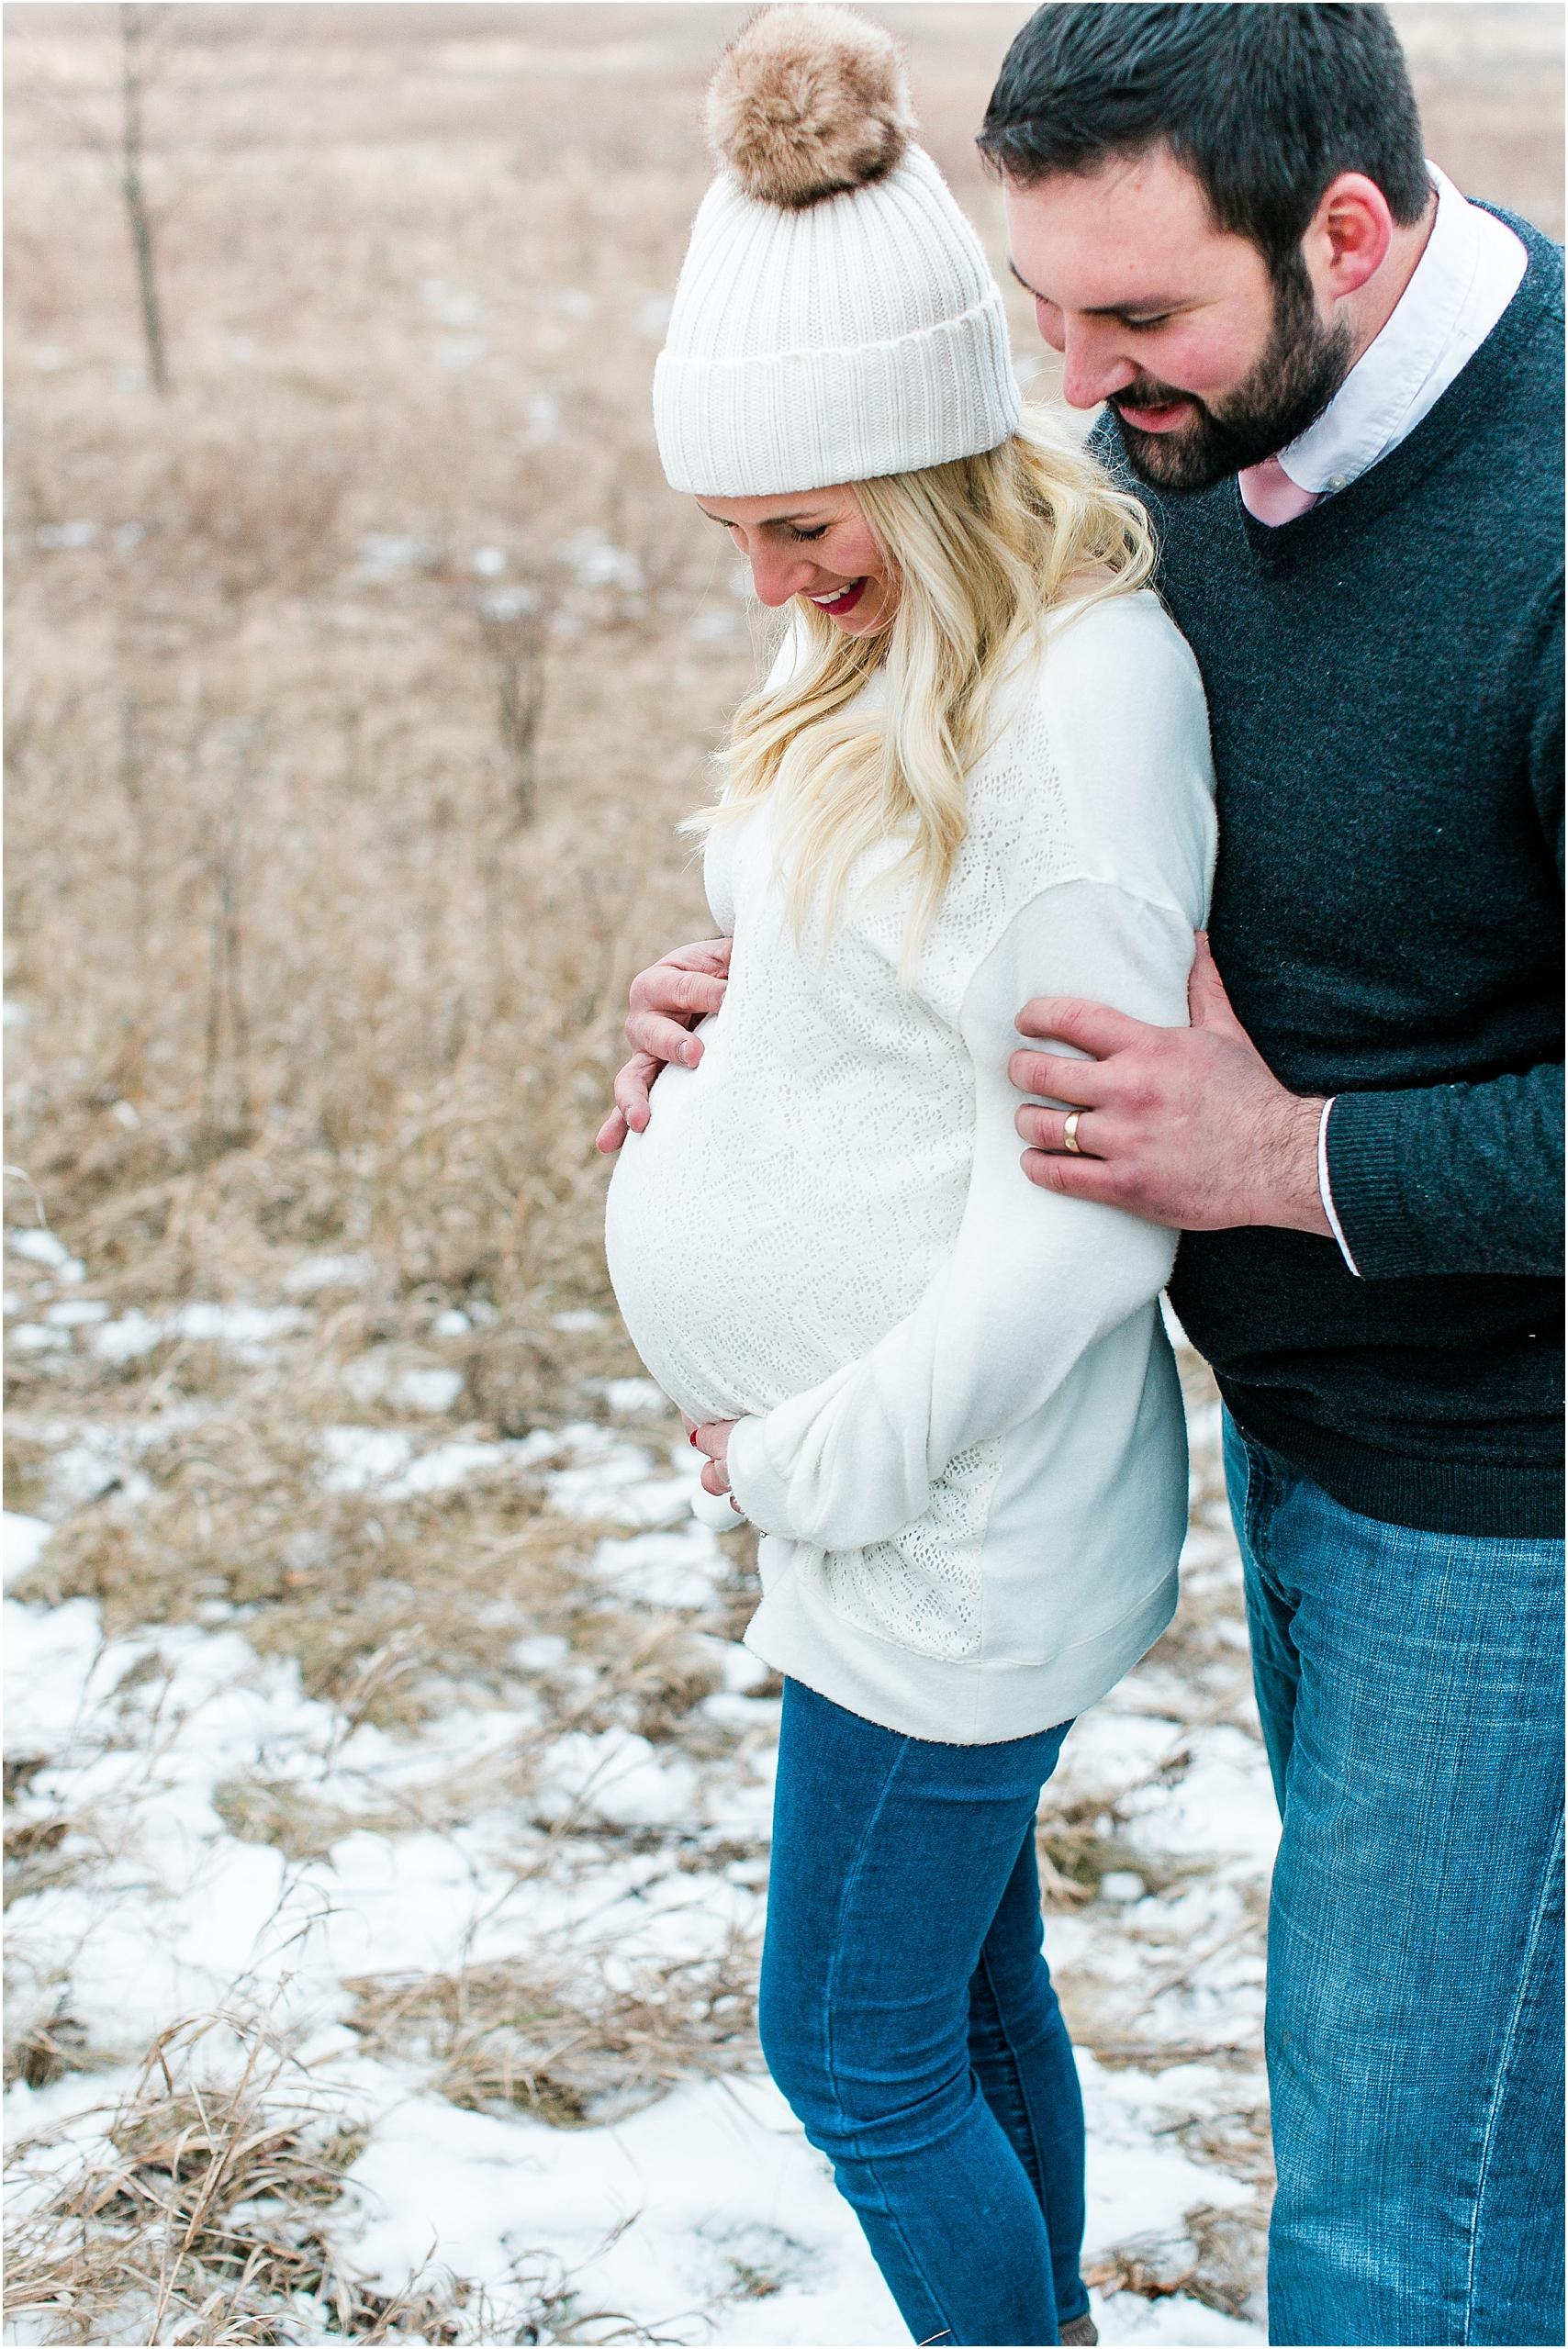 Minnesota winter maternity session Lake Ann Park Chanhassen photographed by Mallory Kiesow, Minnesota maternity photographer_012.jpg